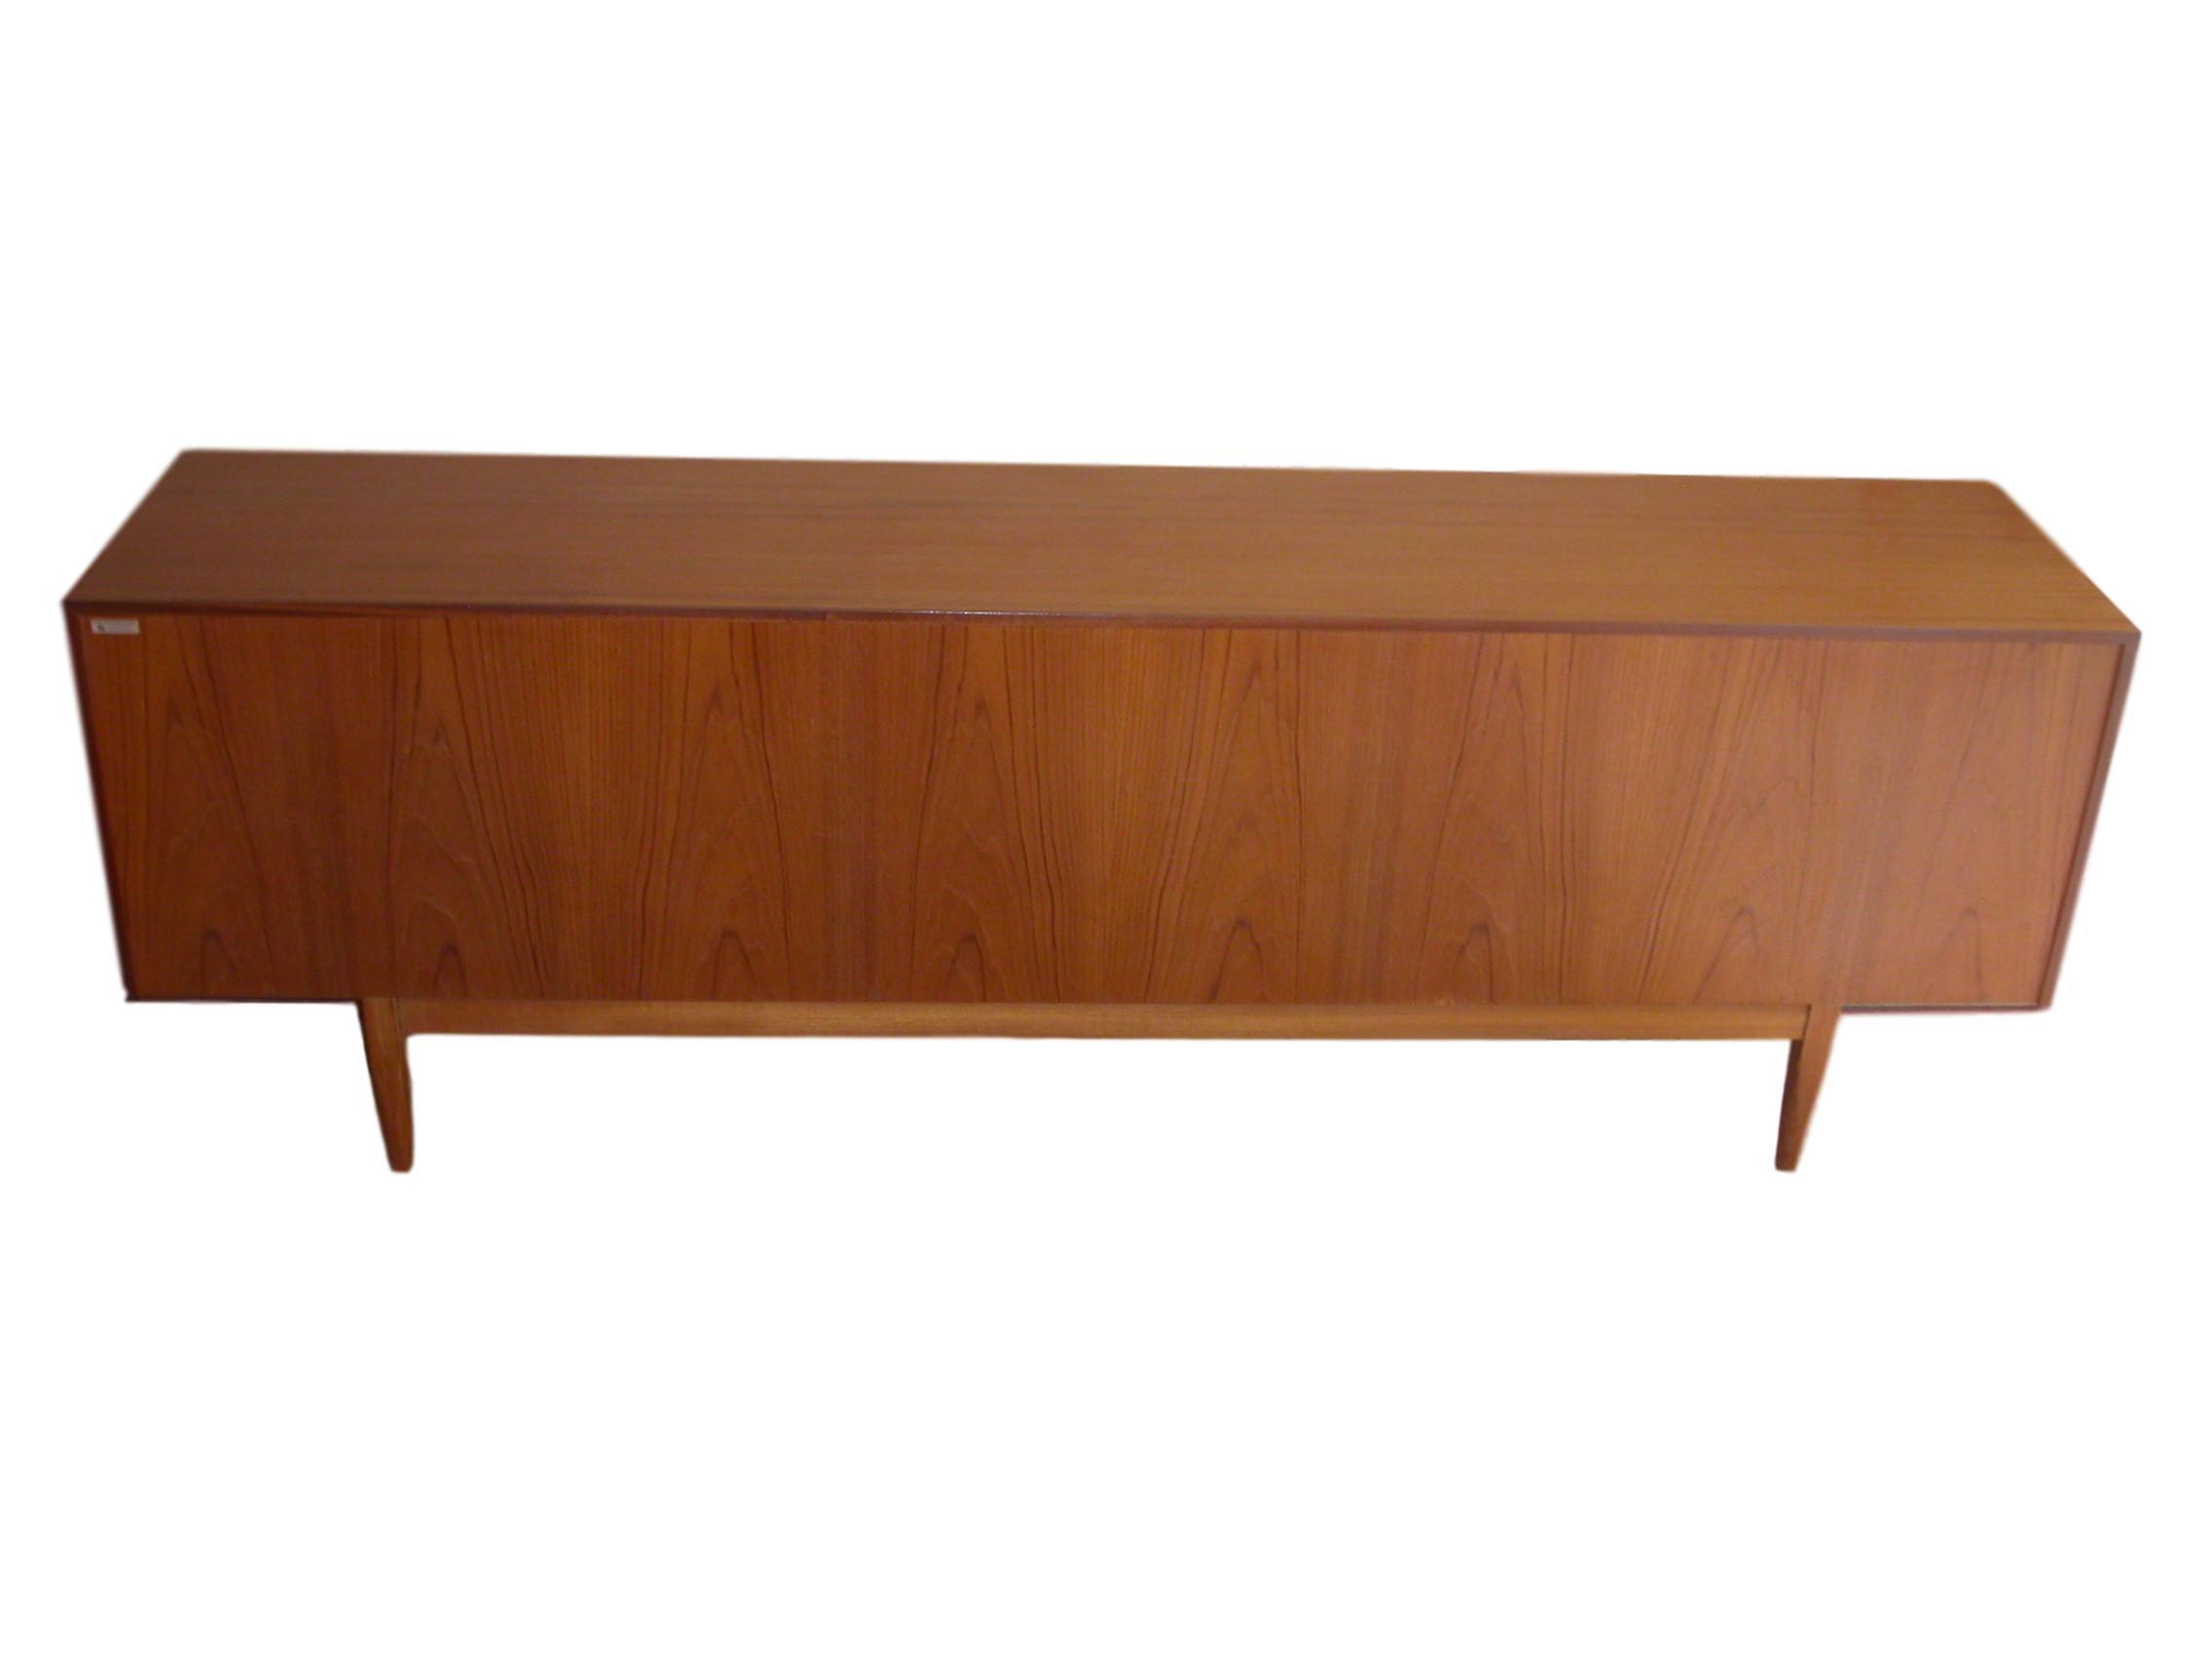 Danish-Modern-Model-66-Teak-Credenza-designed-IB-Kofod-Larsenfor-Faarup-of-Denmark-10